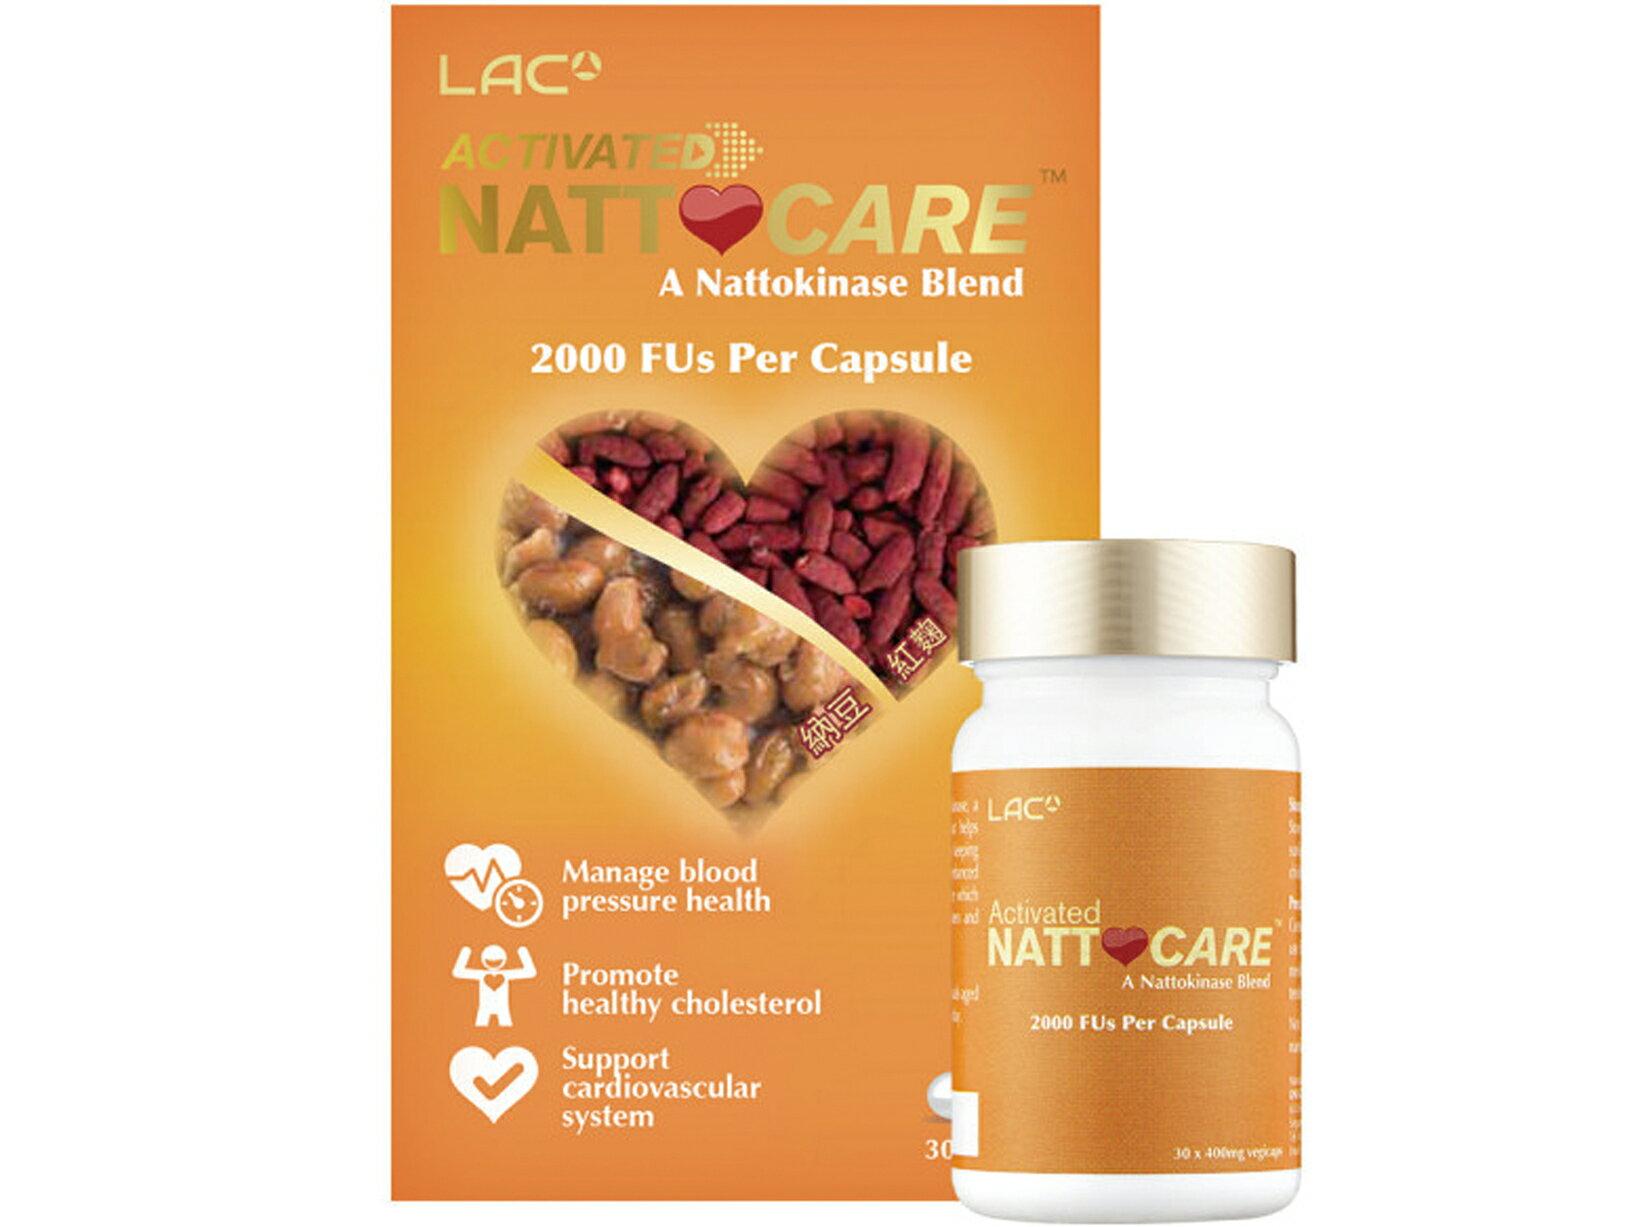 【GNC健安喜】LAC 納豆紅麴膠囊食品 30顆